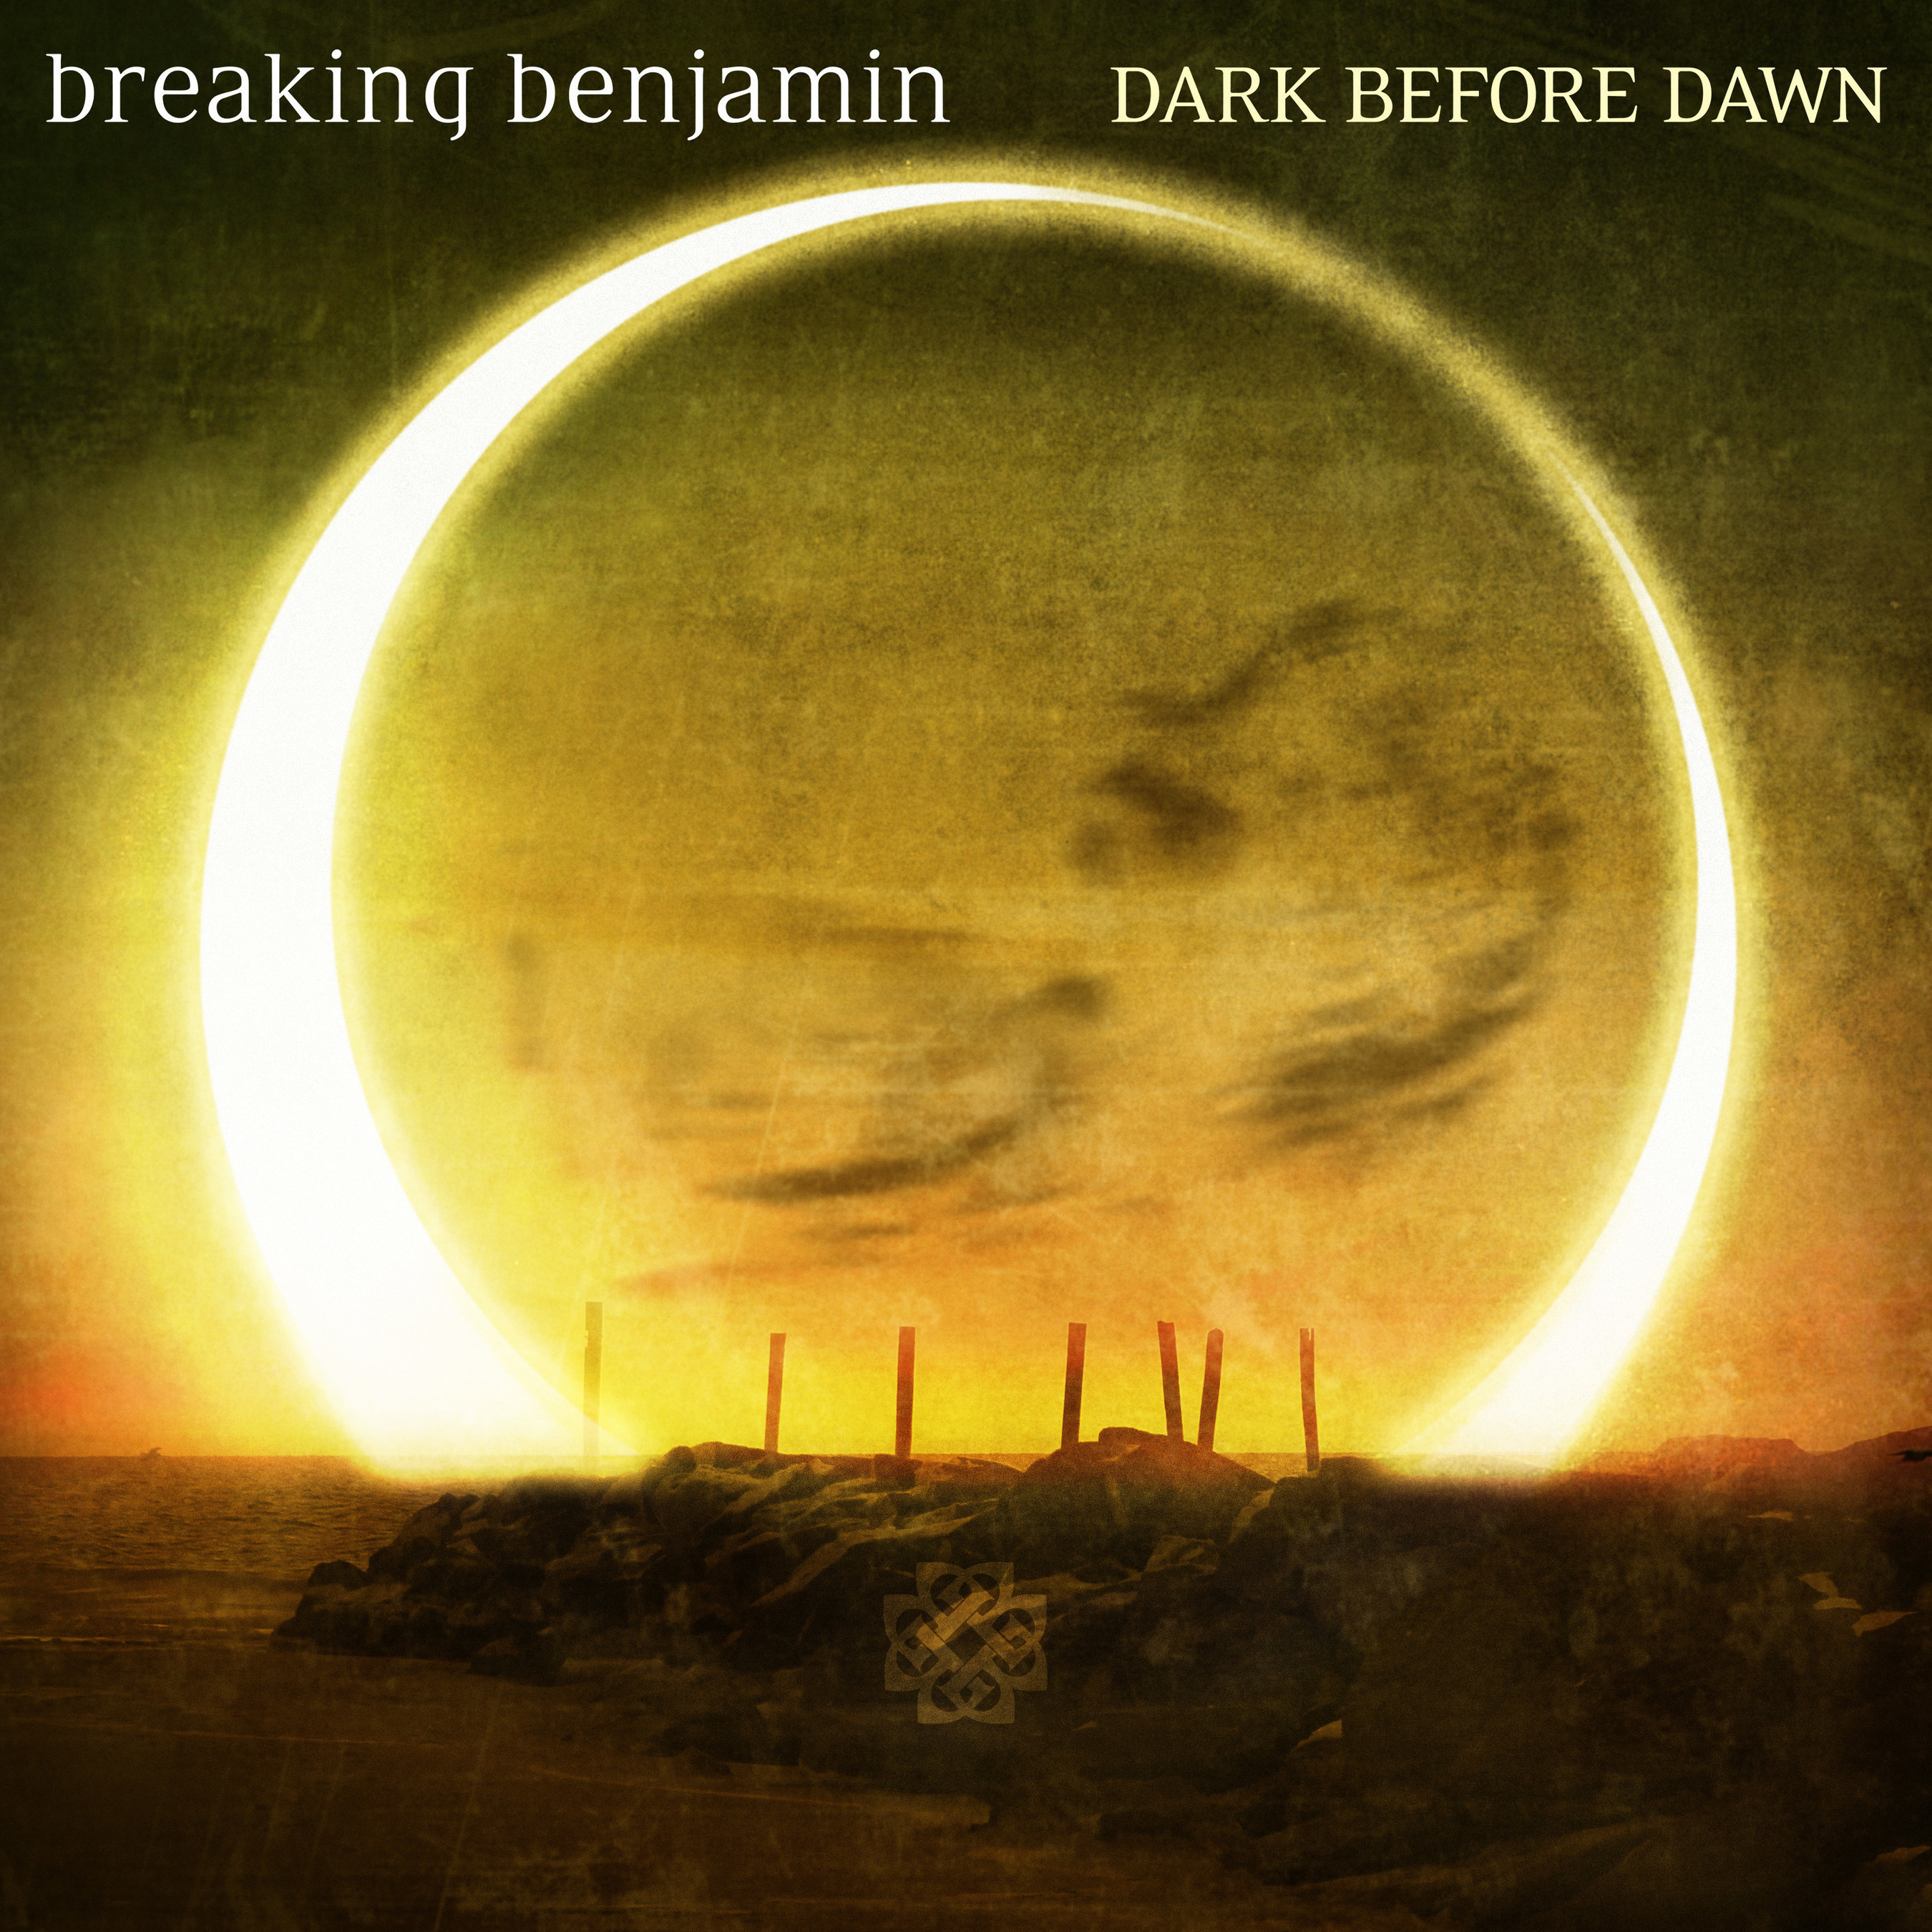 Dark Before Dawn / Hollywood Records